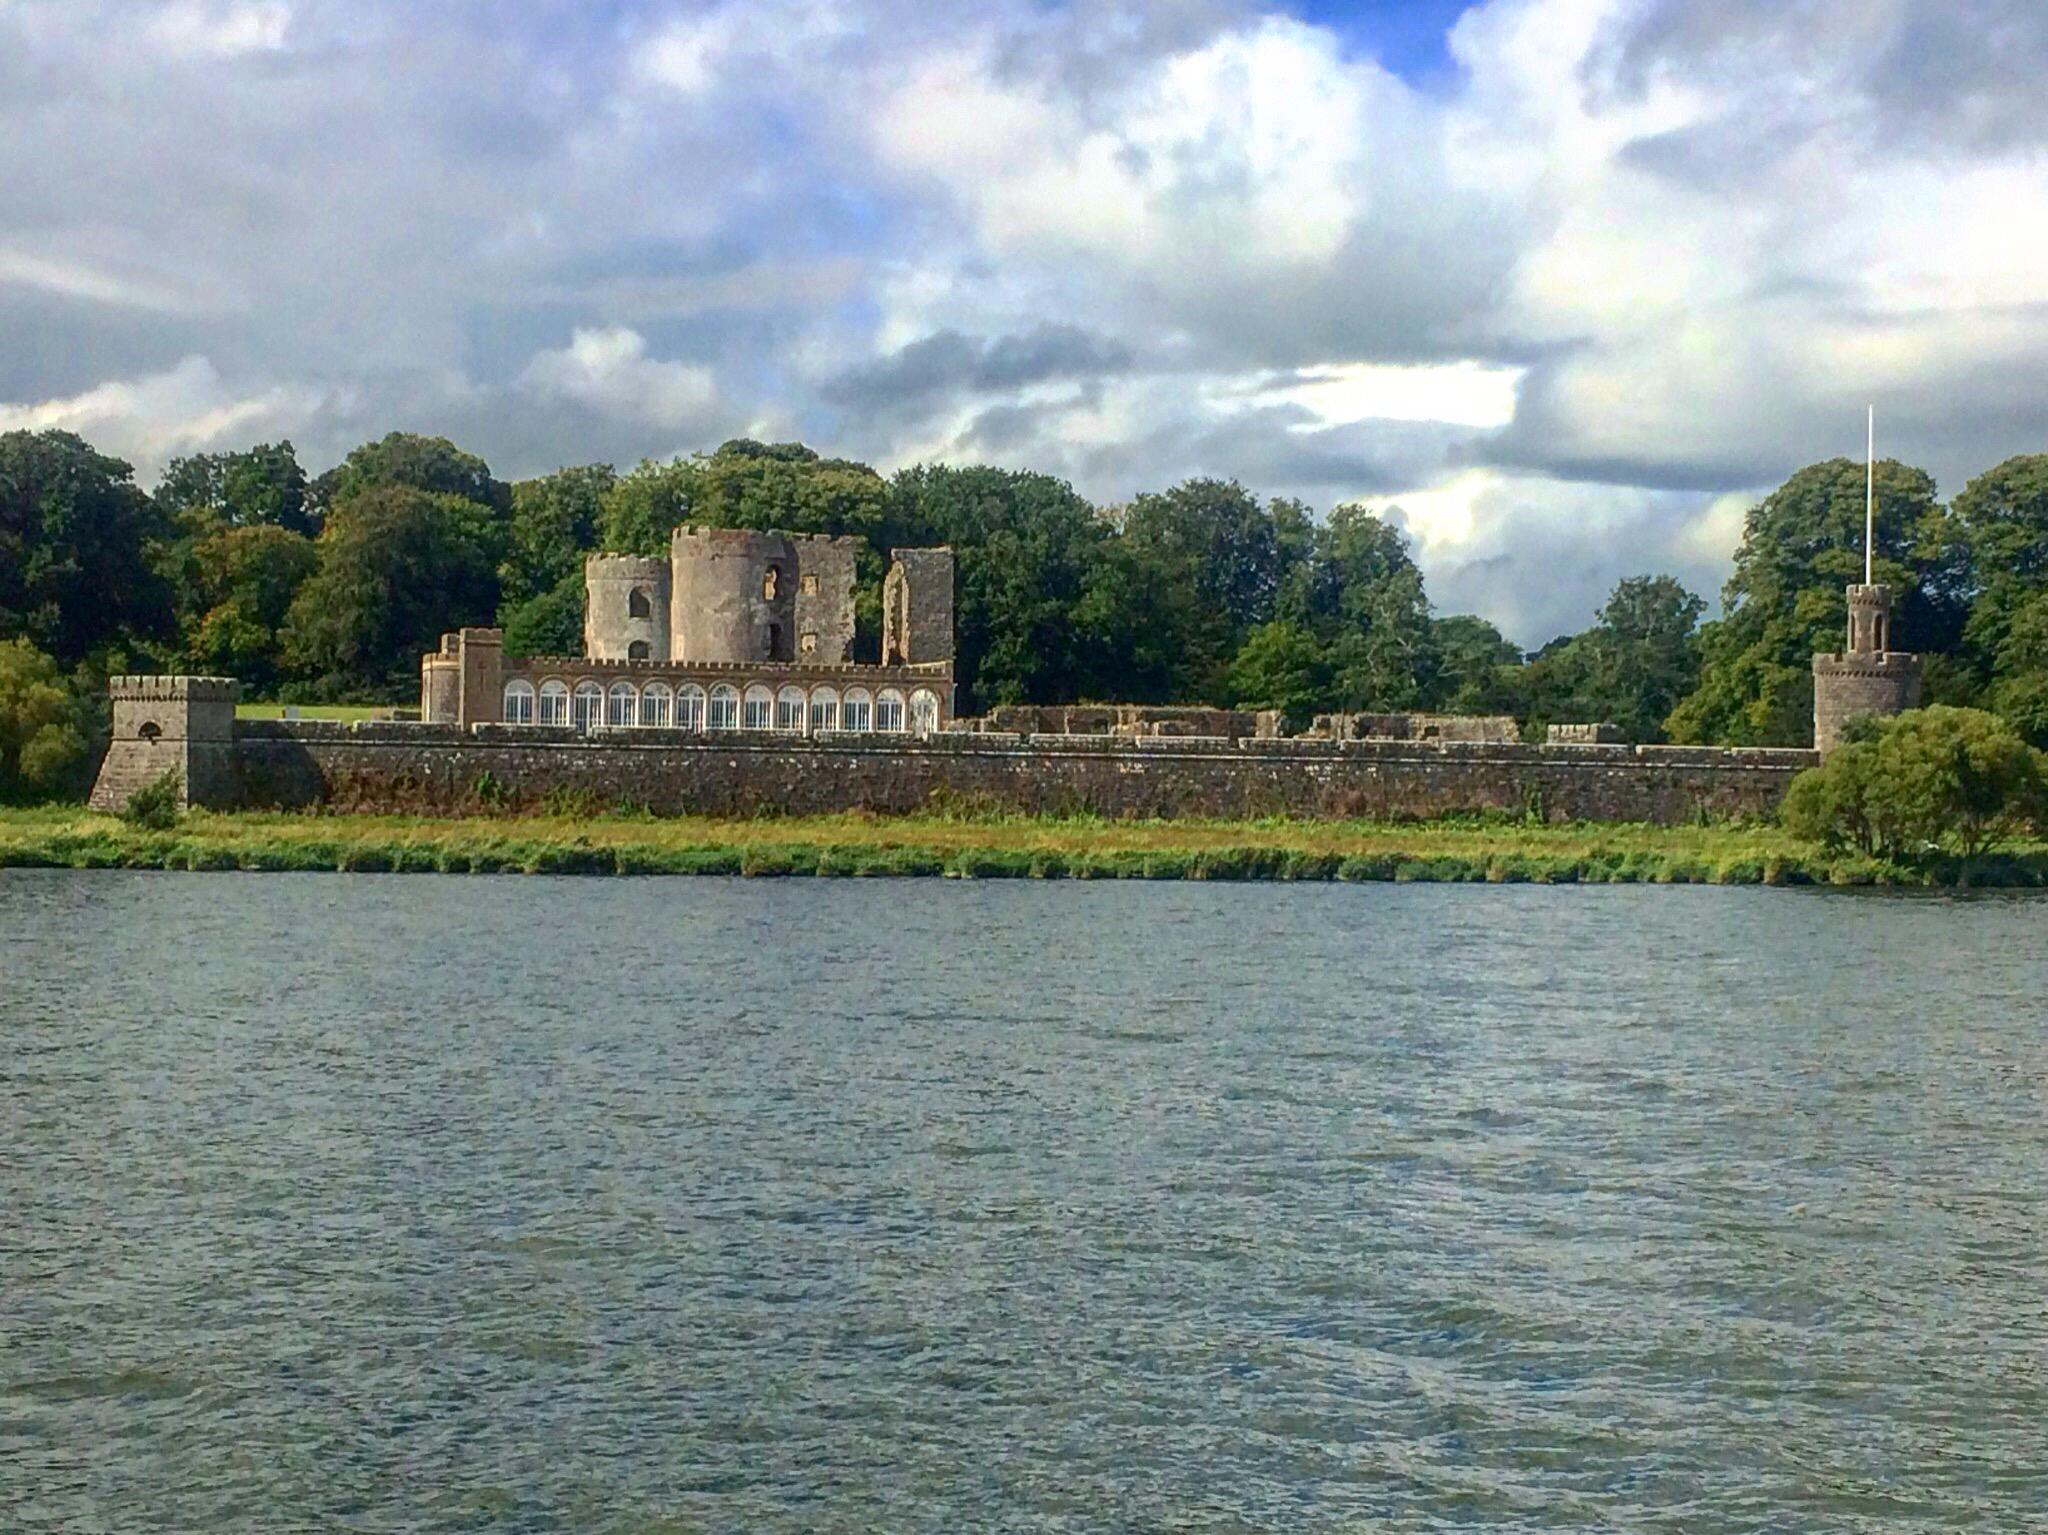 shanes_castle_view_boats_antrim_castle_walled_garden_lough_neagh_northern_ireland_ni_explorer_niexplorer (1)